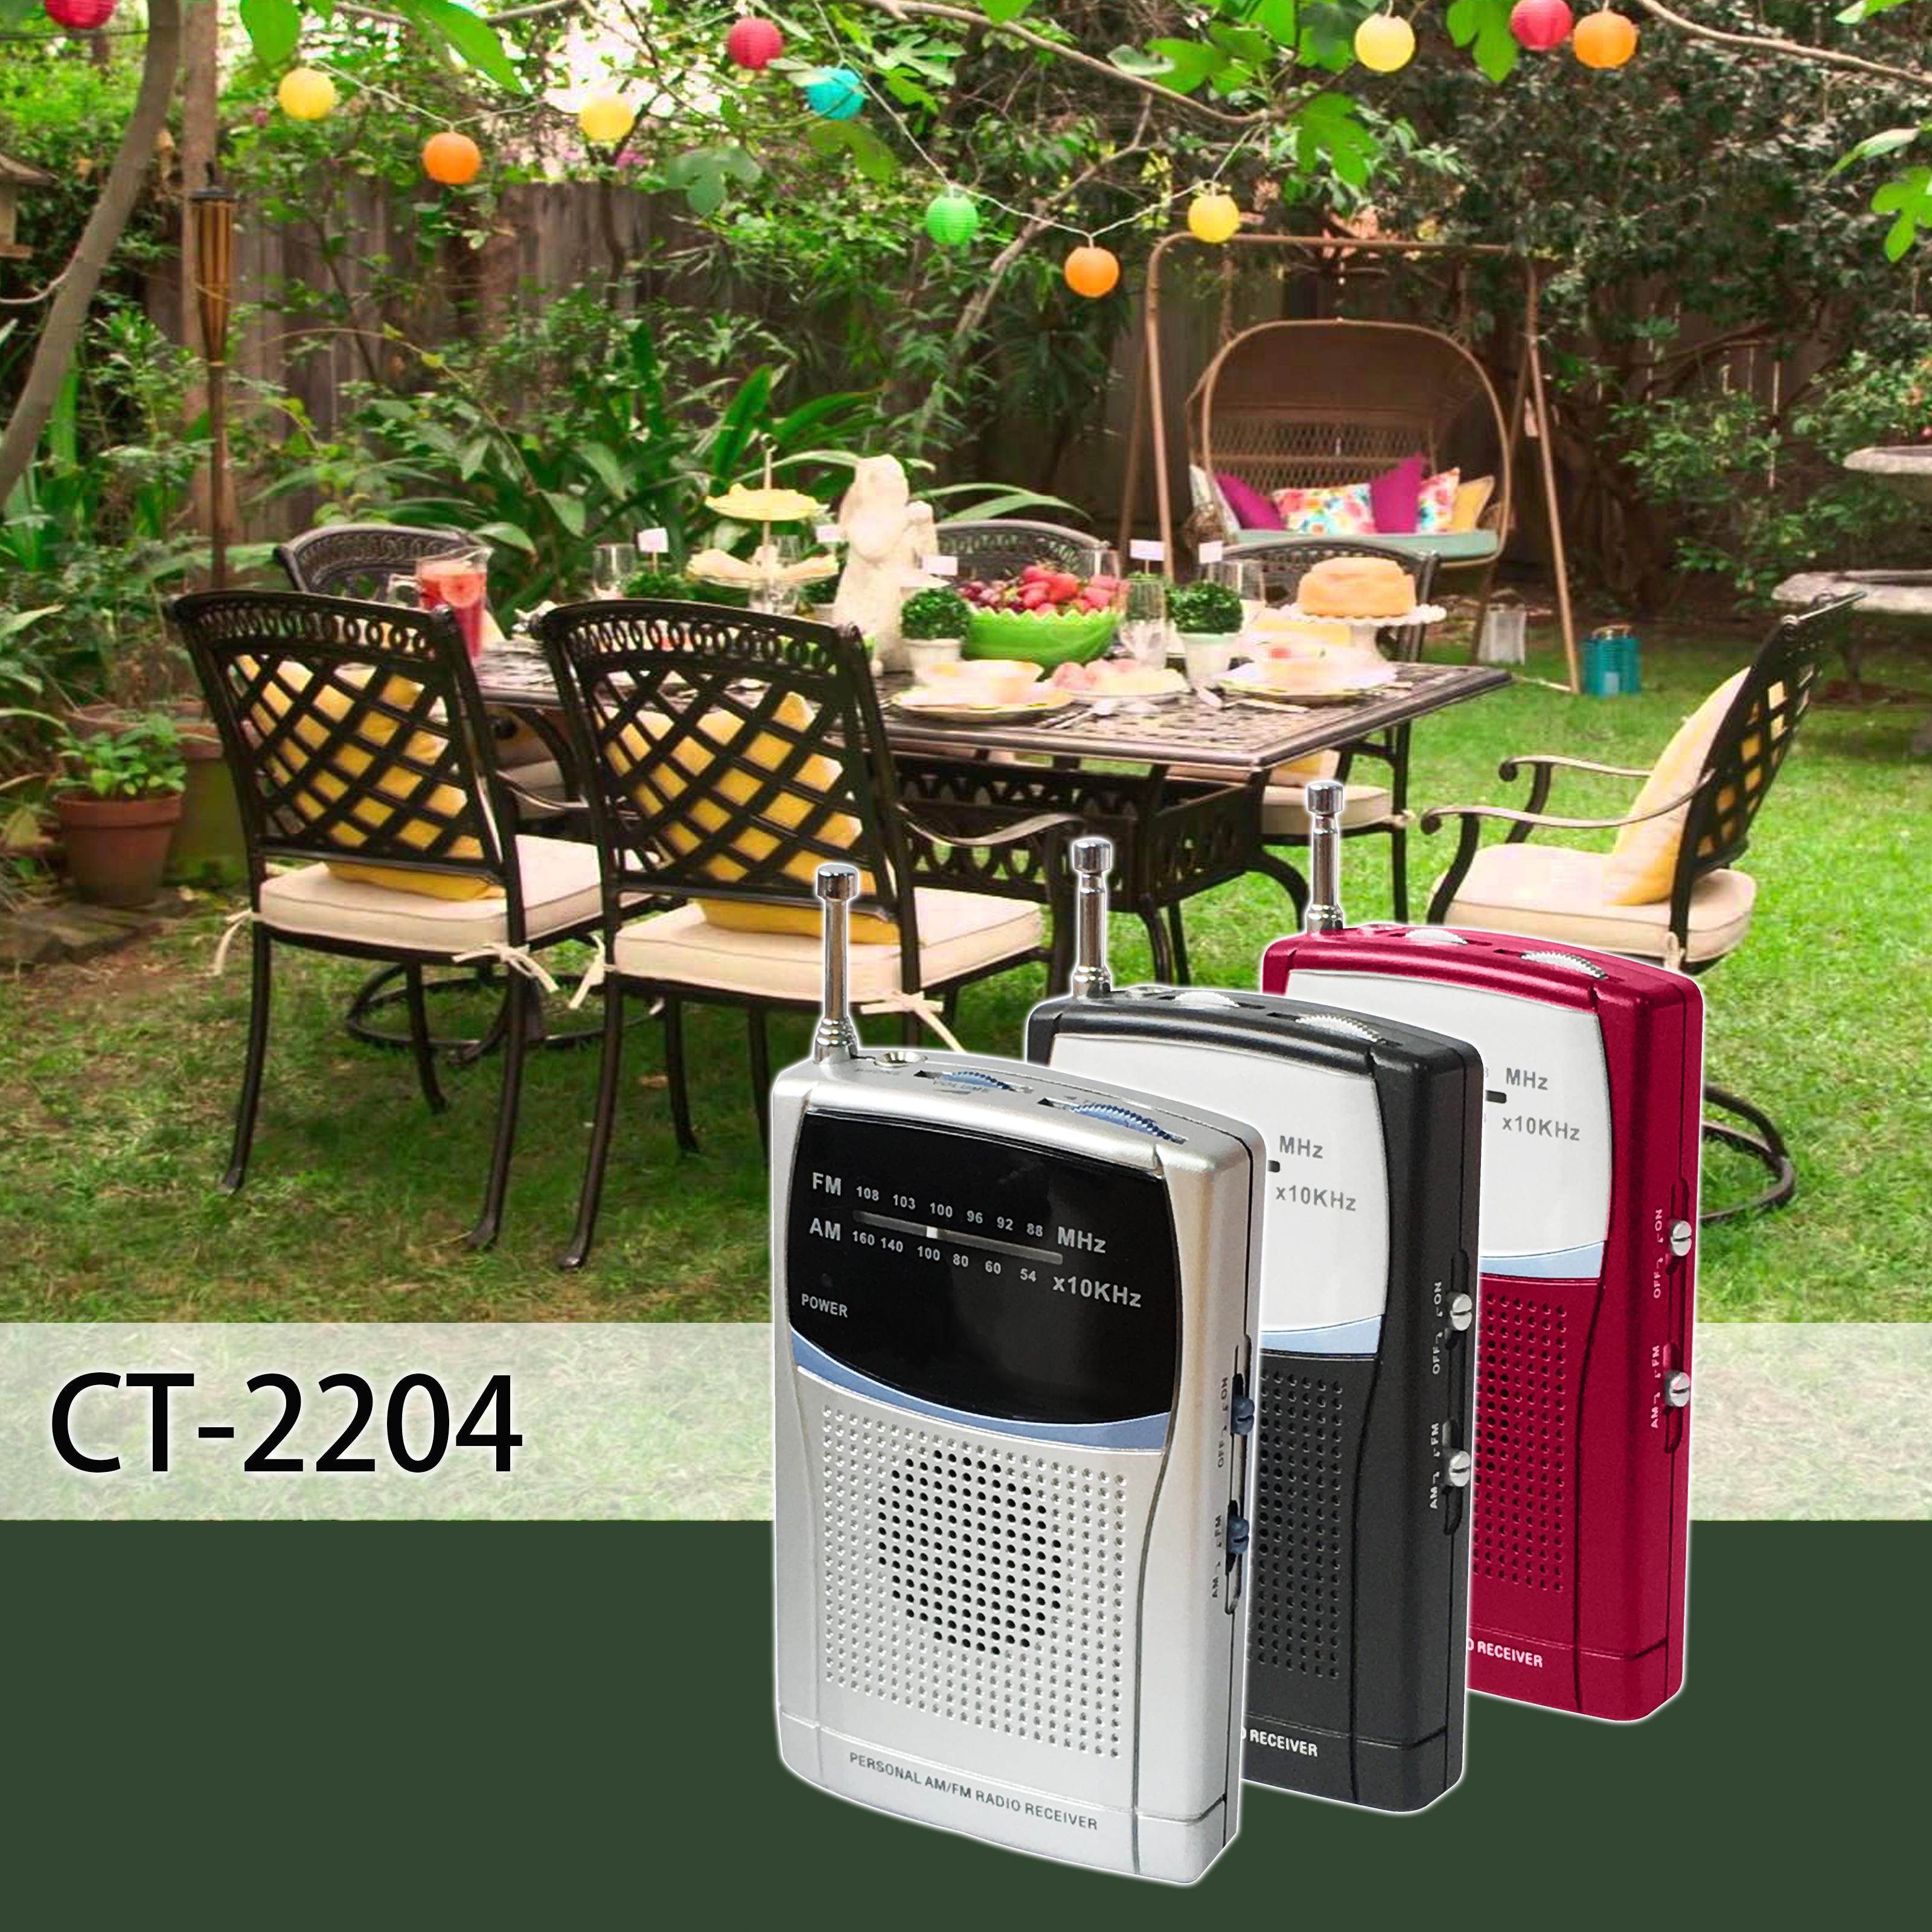 CT-2204 garden.jpg